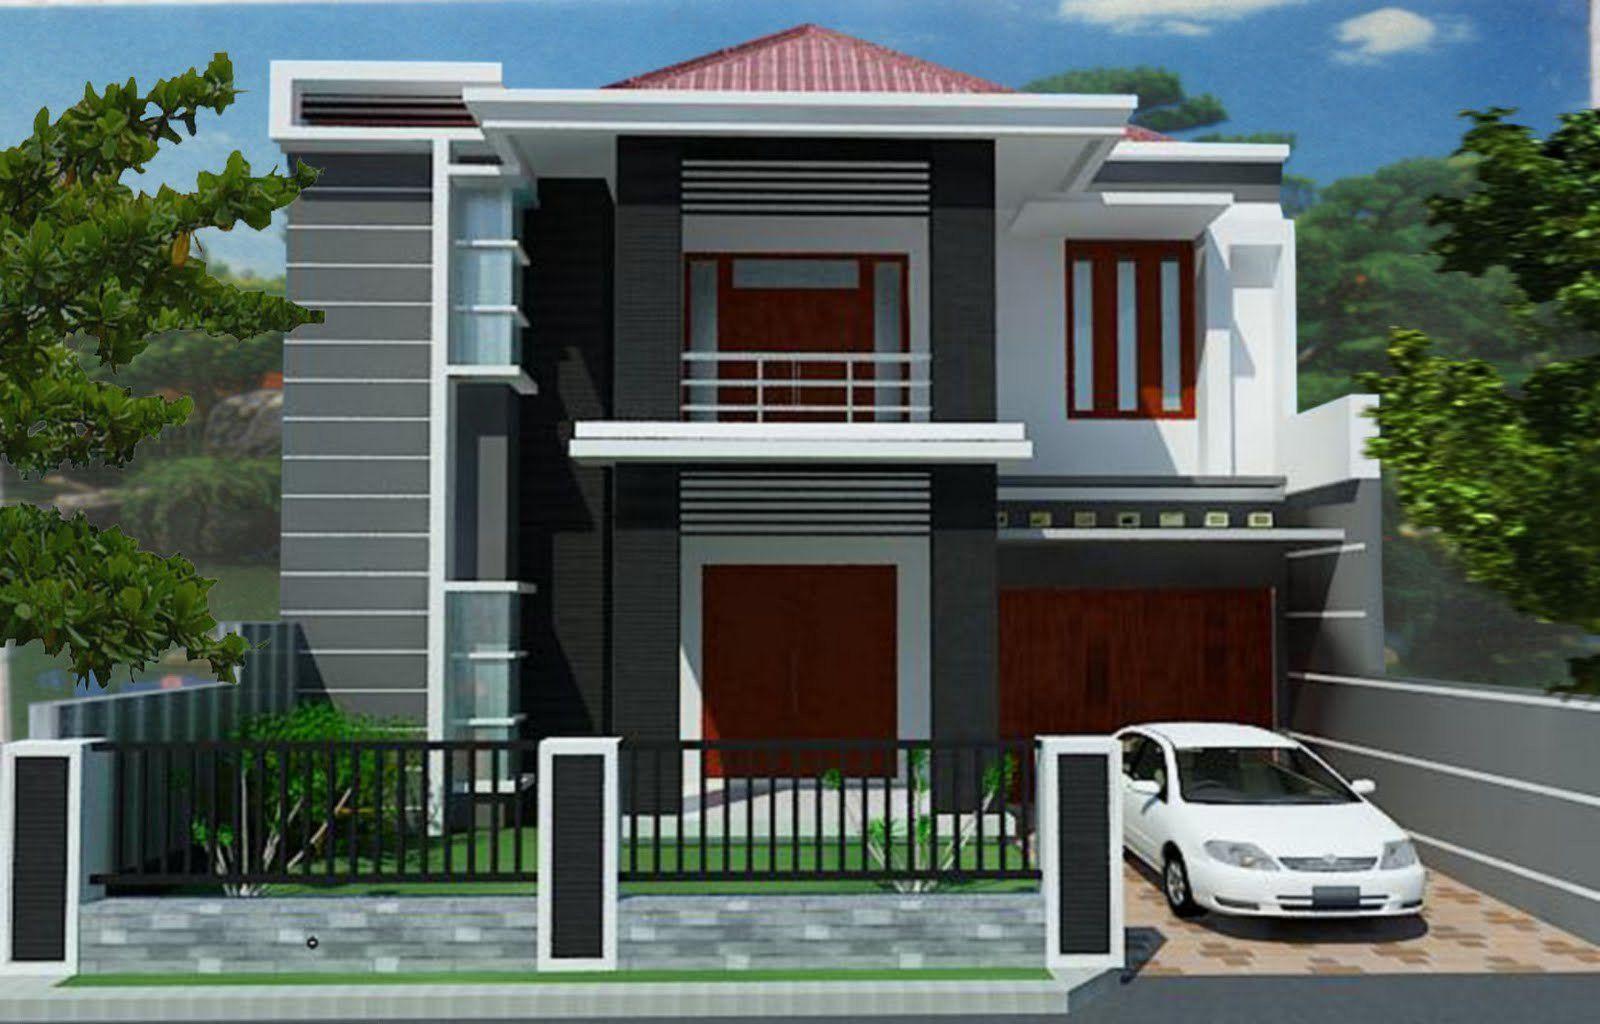 Download Desain Rumah 2 Lantai 100 Juta Keren Gratis House Balcony Design Two Storey House Design House Roof Design